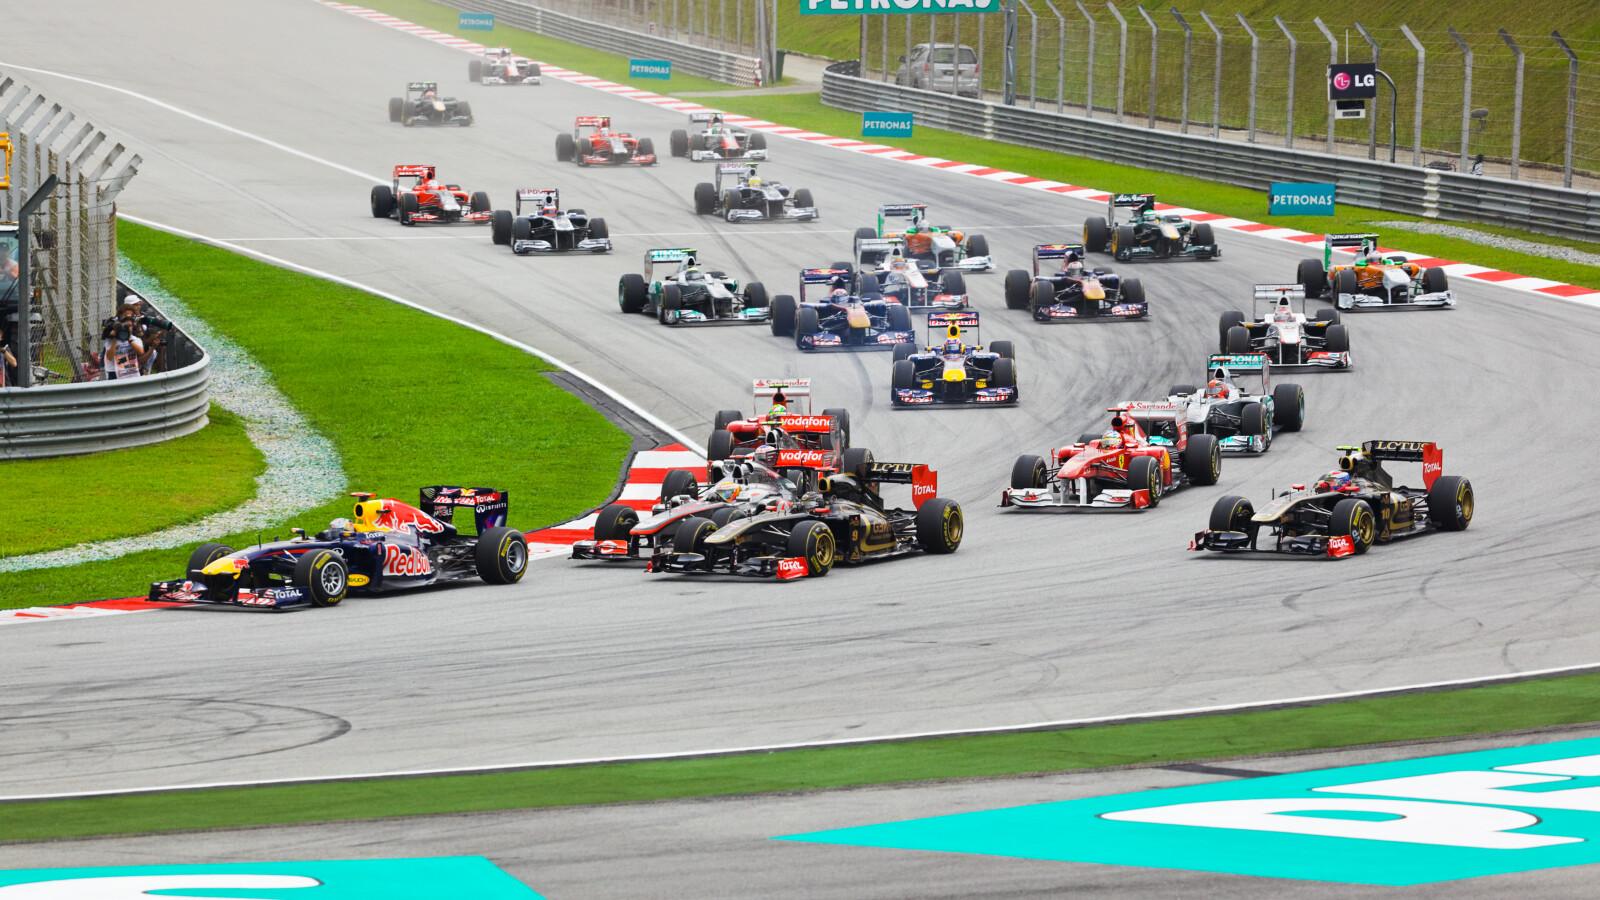 Formel 1 Rennen Heute Wiederholung